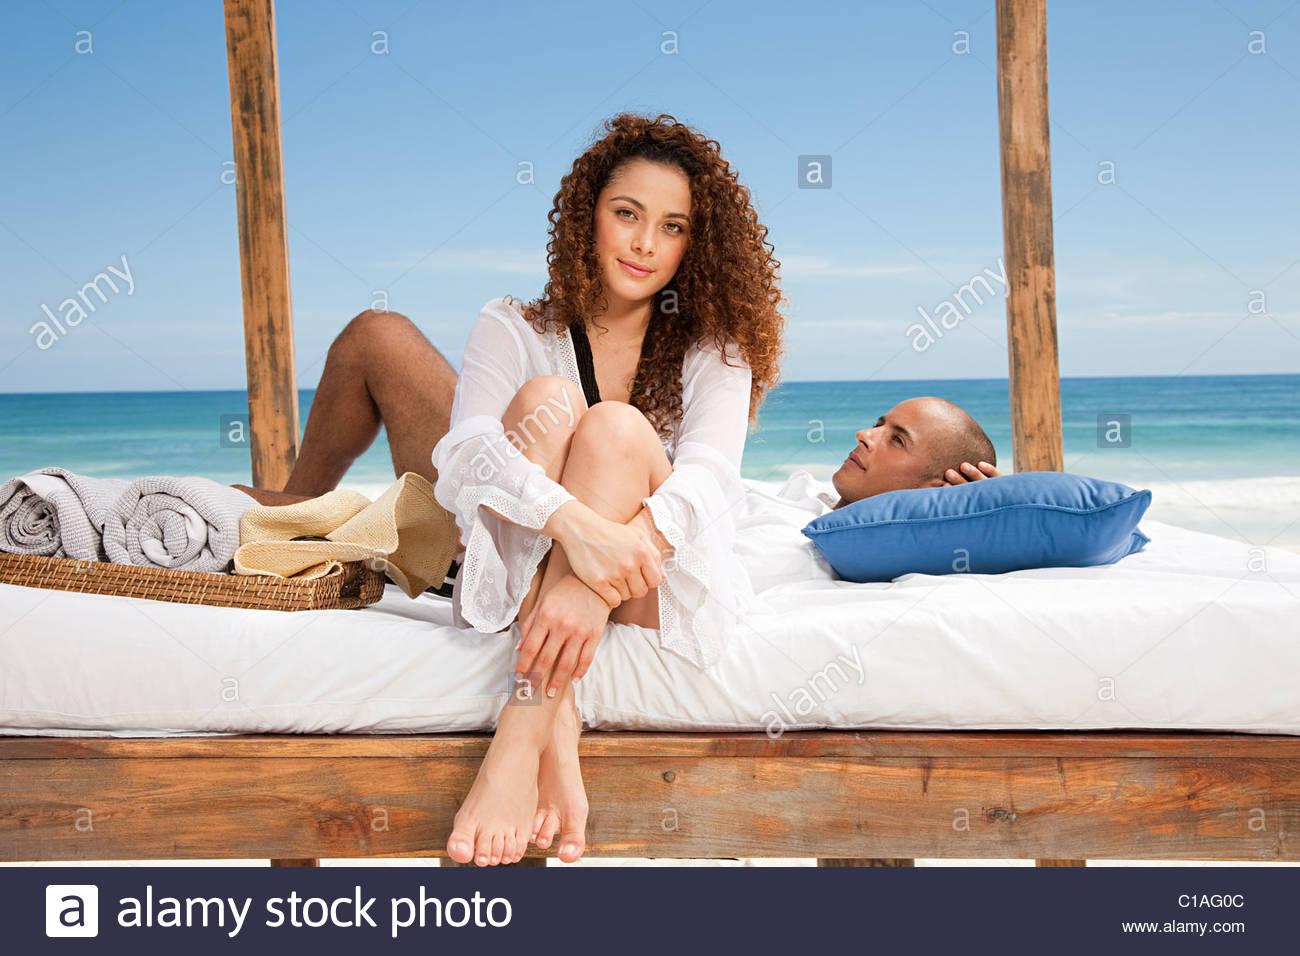 Paar Am Bett Am Strand Im Urlaub Stockfoto Bild 35267468 Alamy